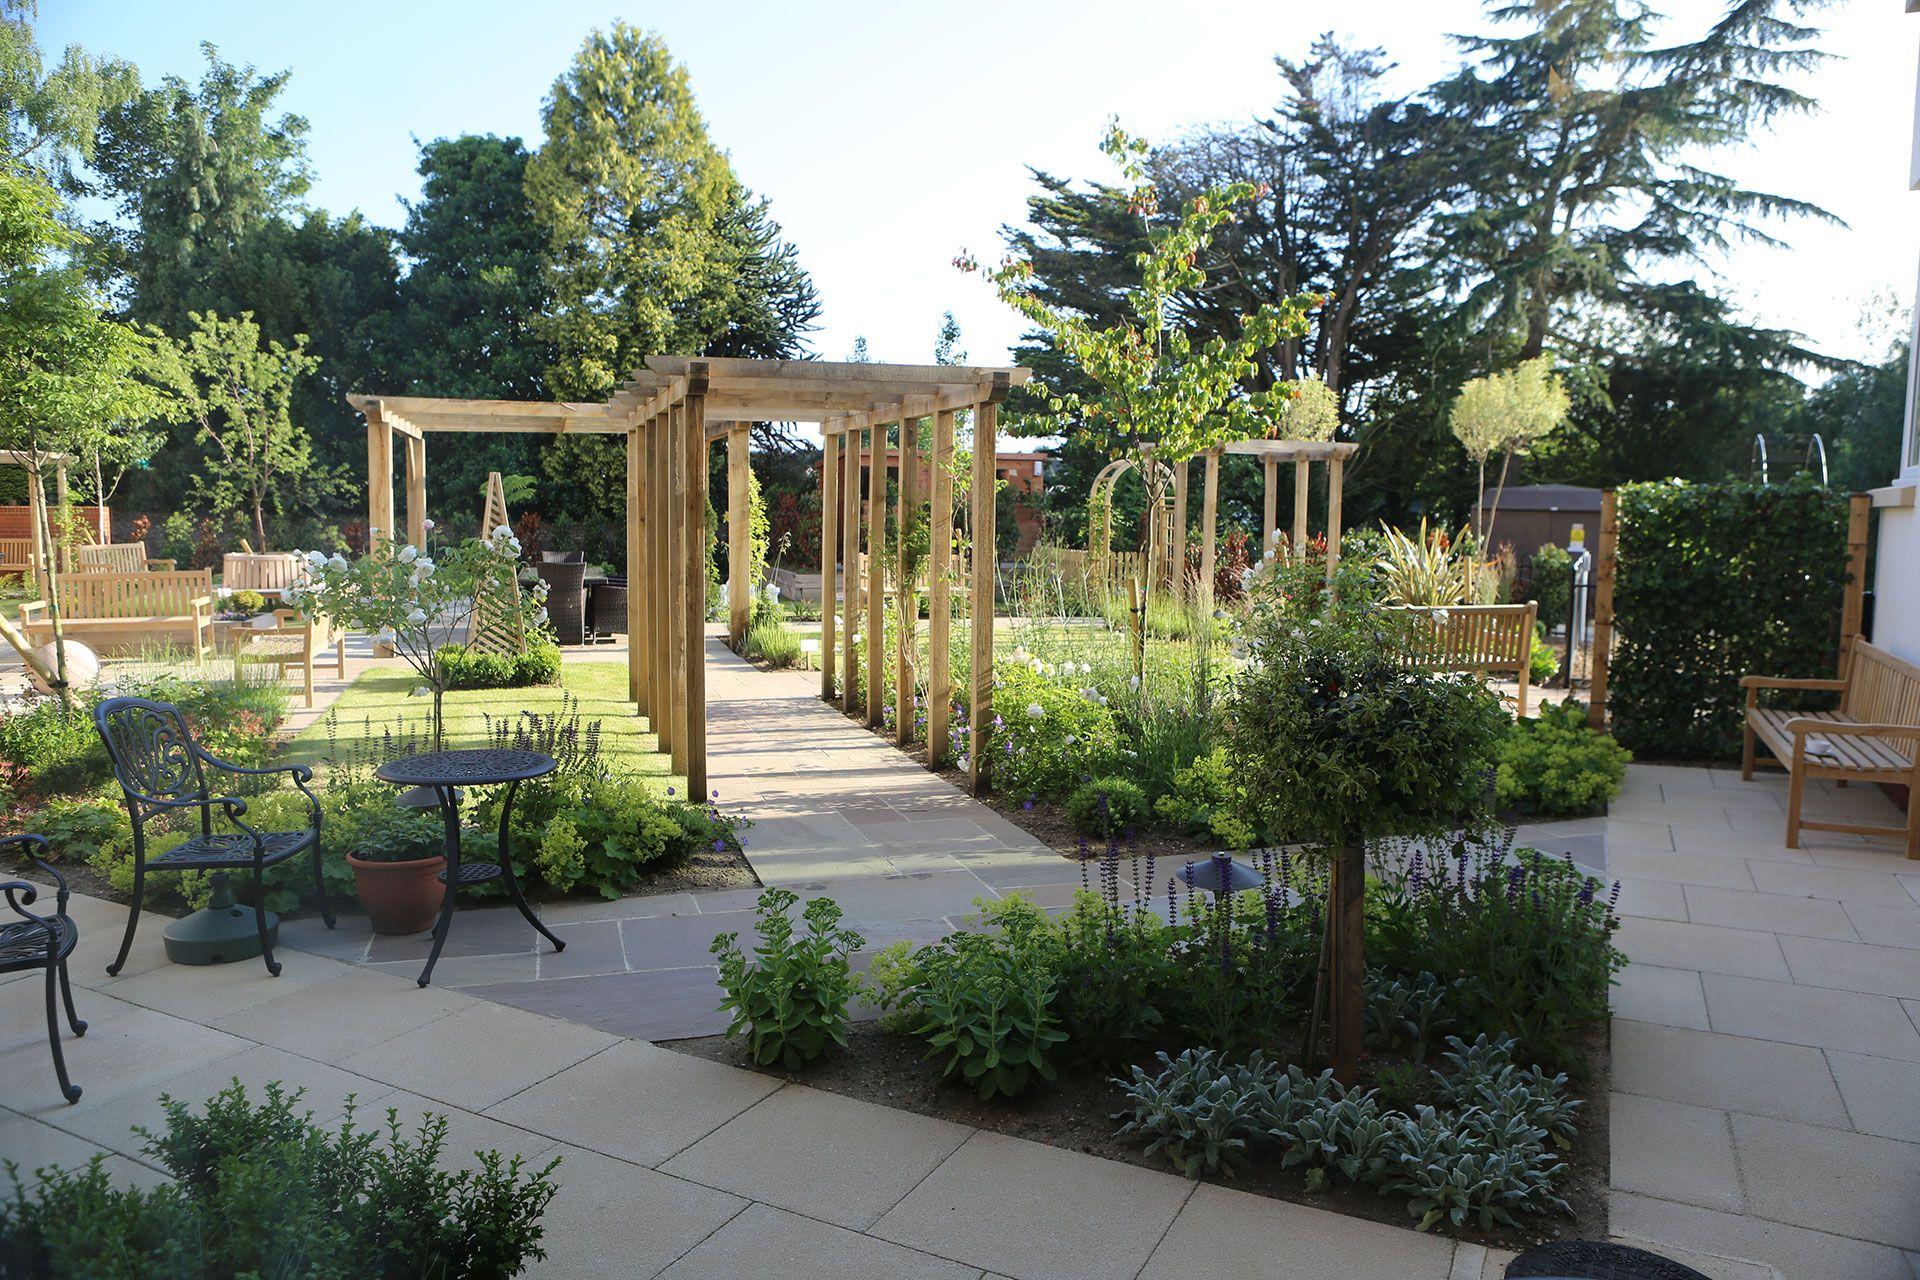 Park View Care Home Ipswich Aralia Garden Design Landscape Garden Design Landscape Design Healing Garden Design Garden Landscape Design